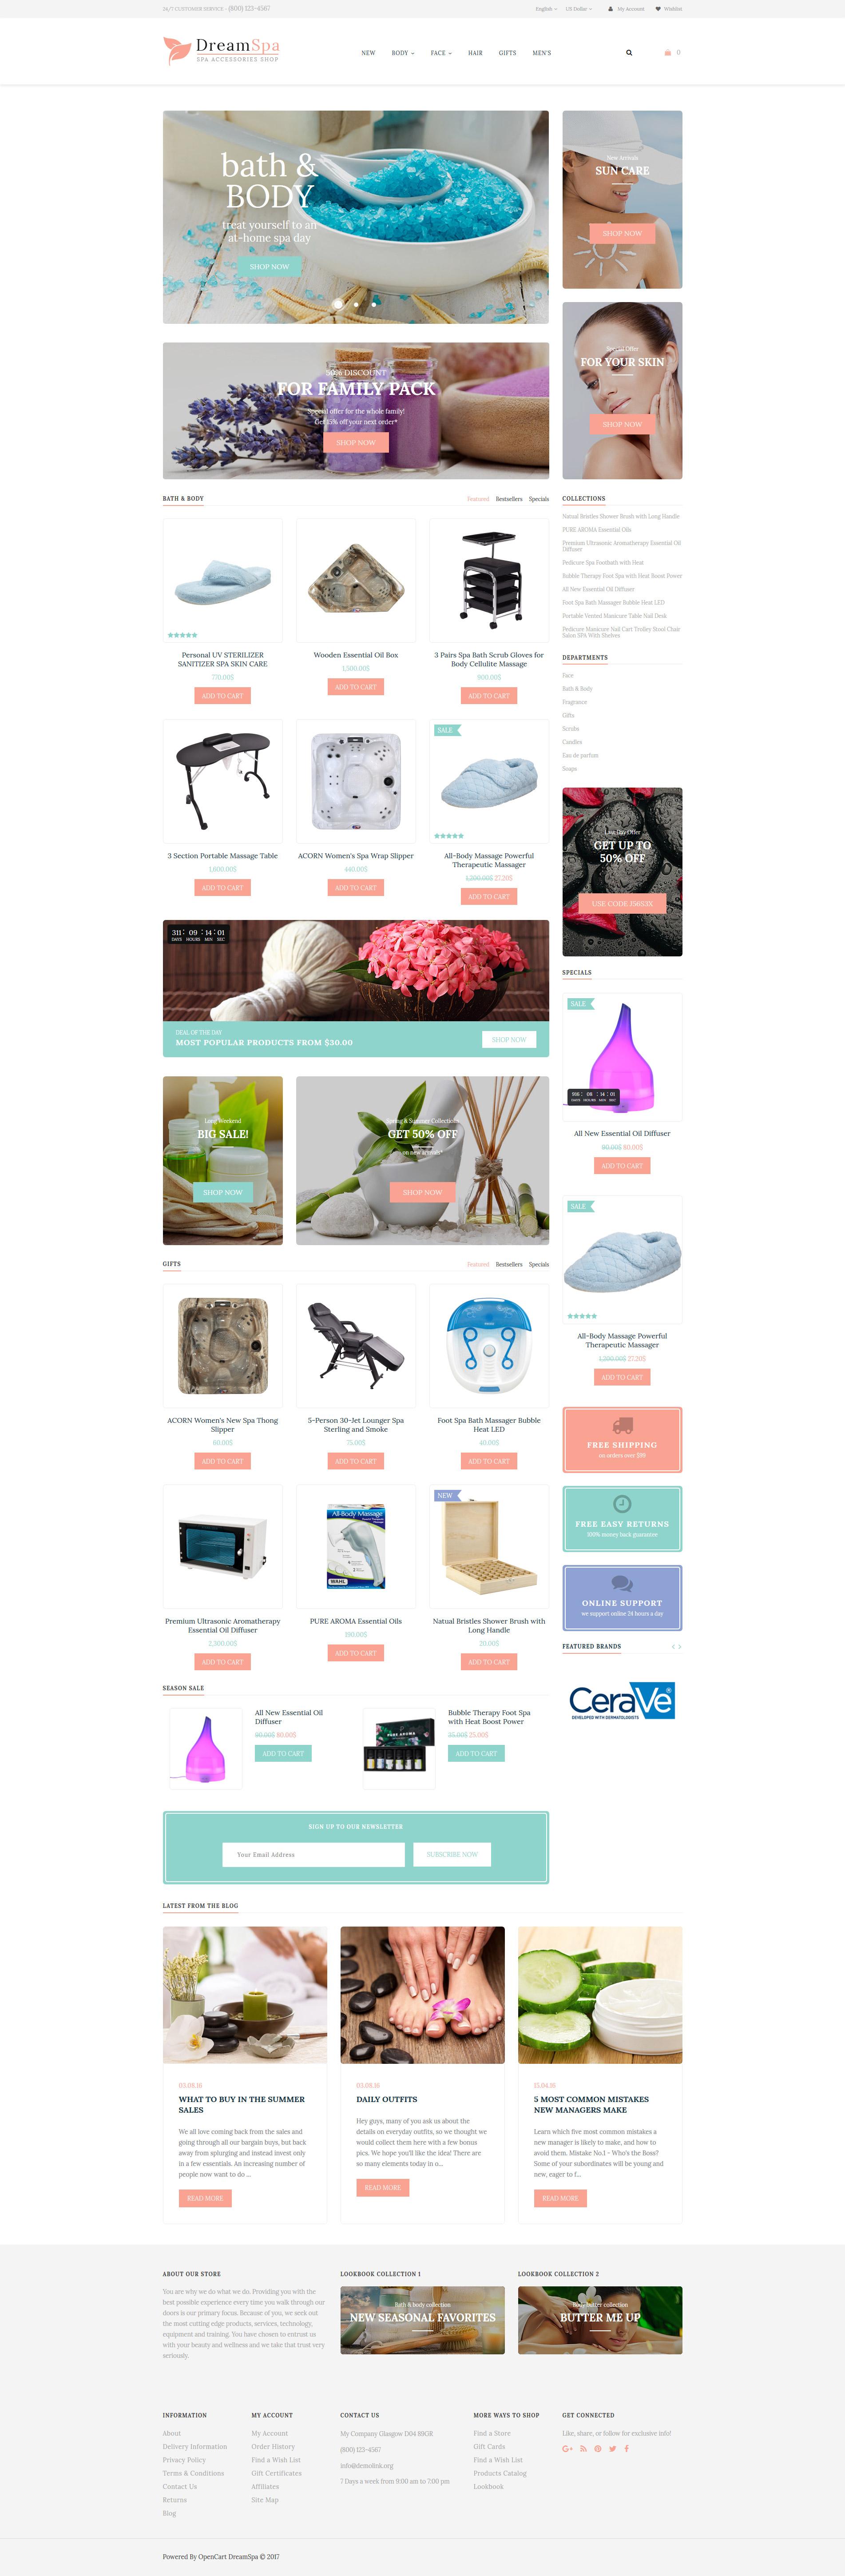 Spa Accessories Responsive OpenCart Template - screenshot